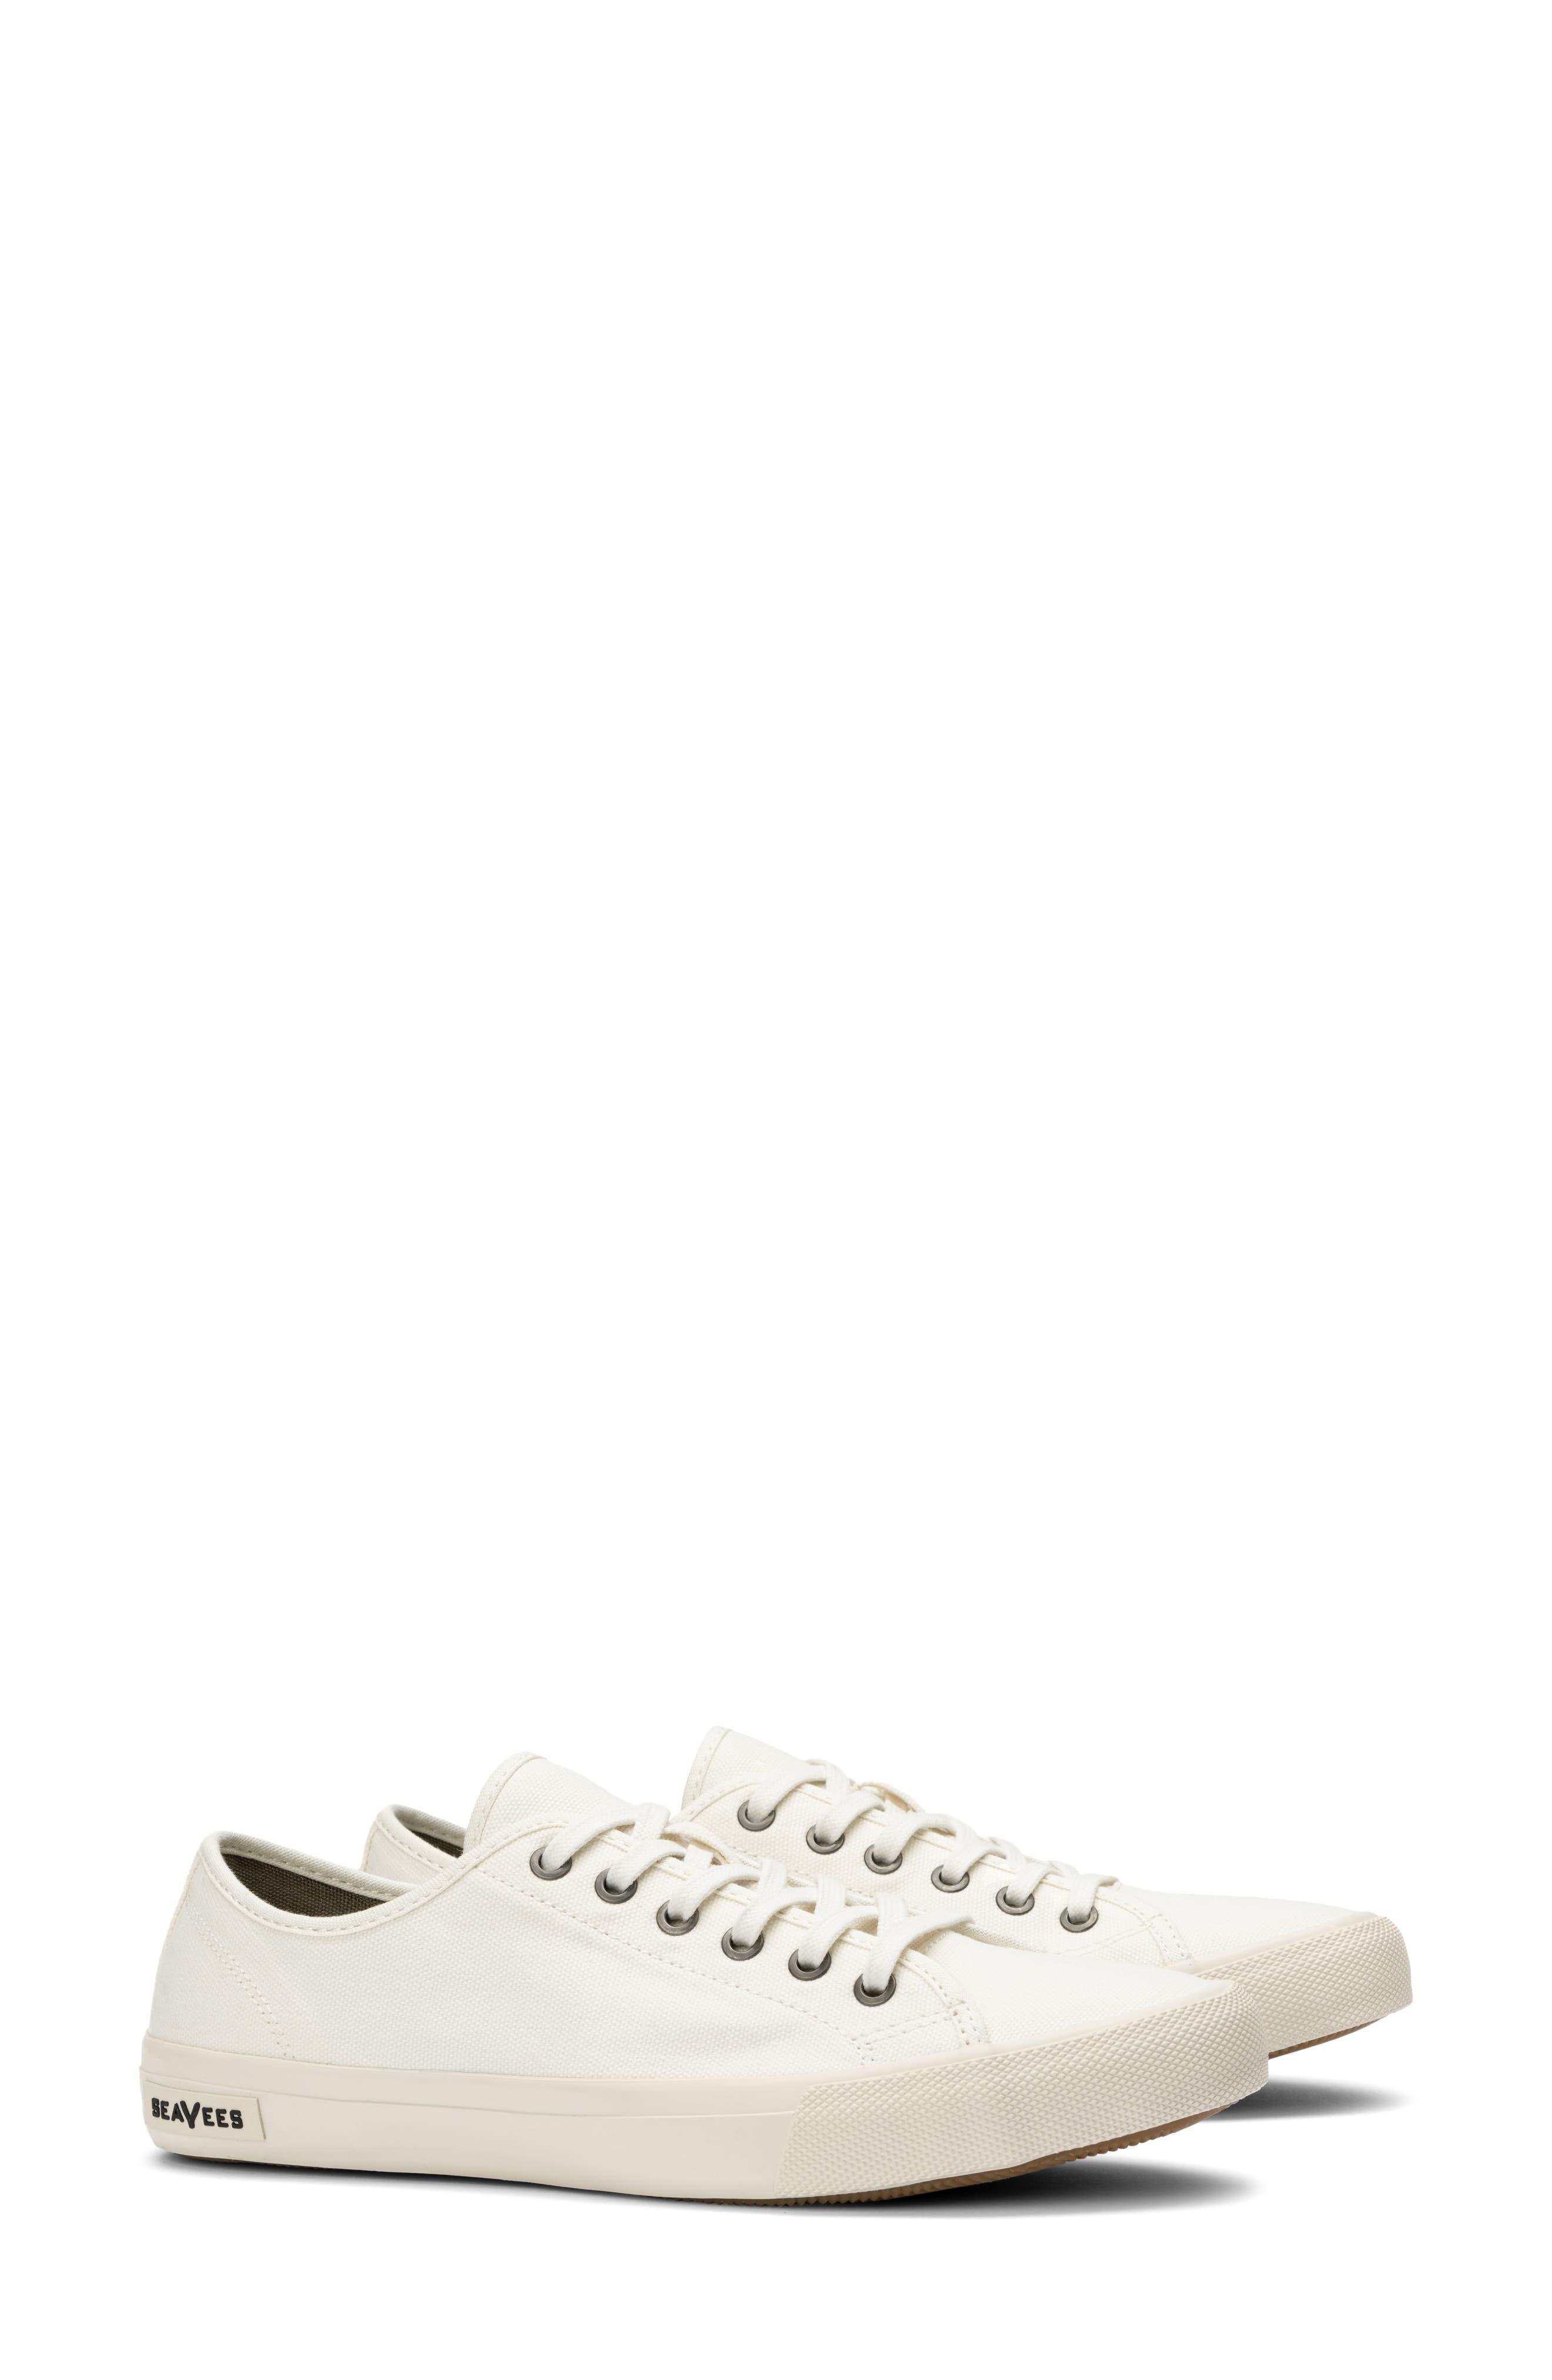 Men's SeaVees Shoes | Nordstrom